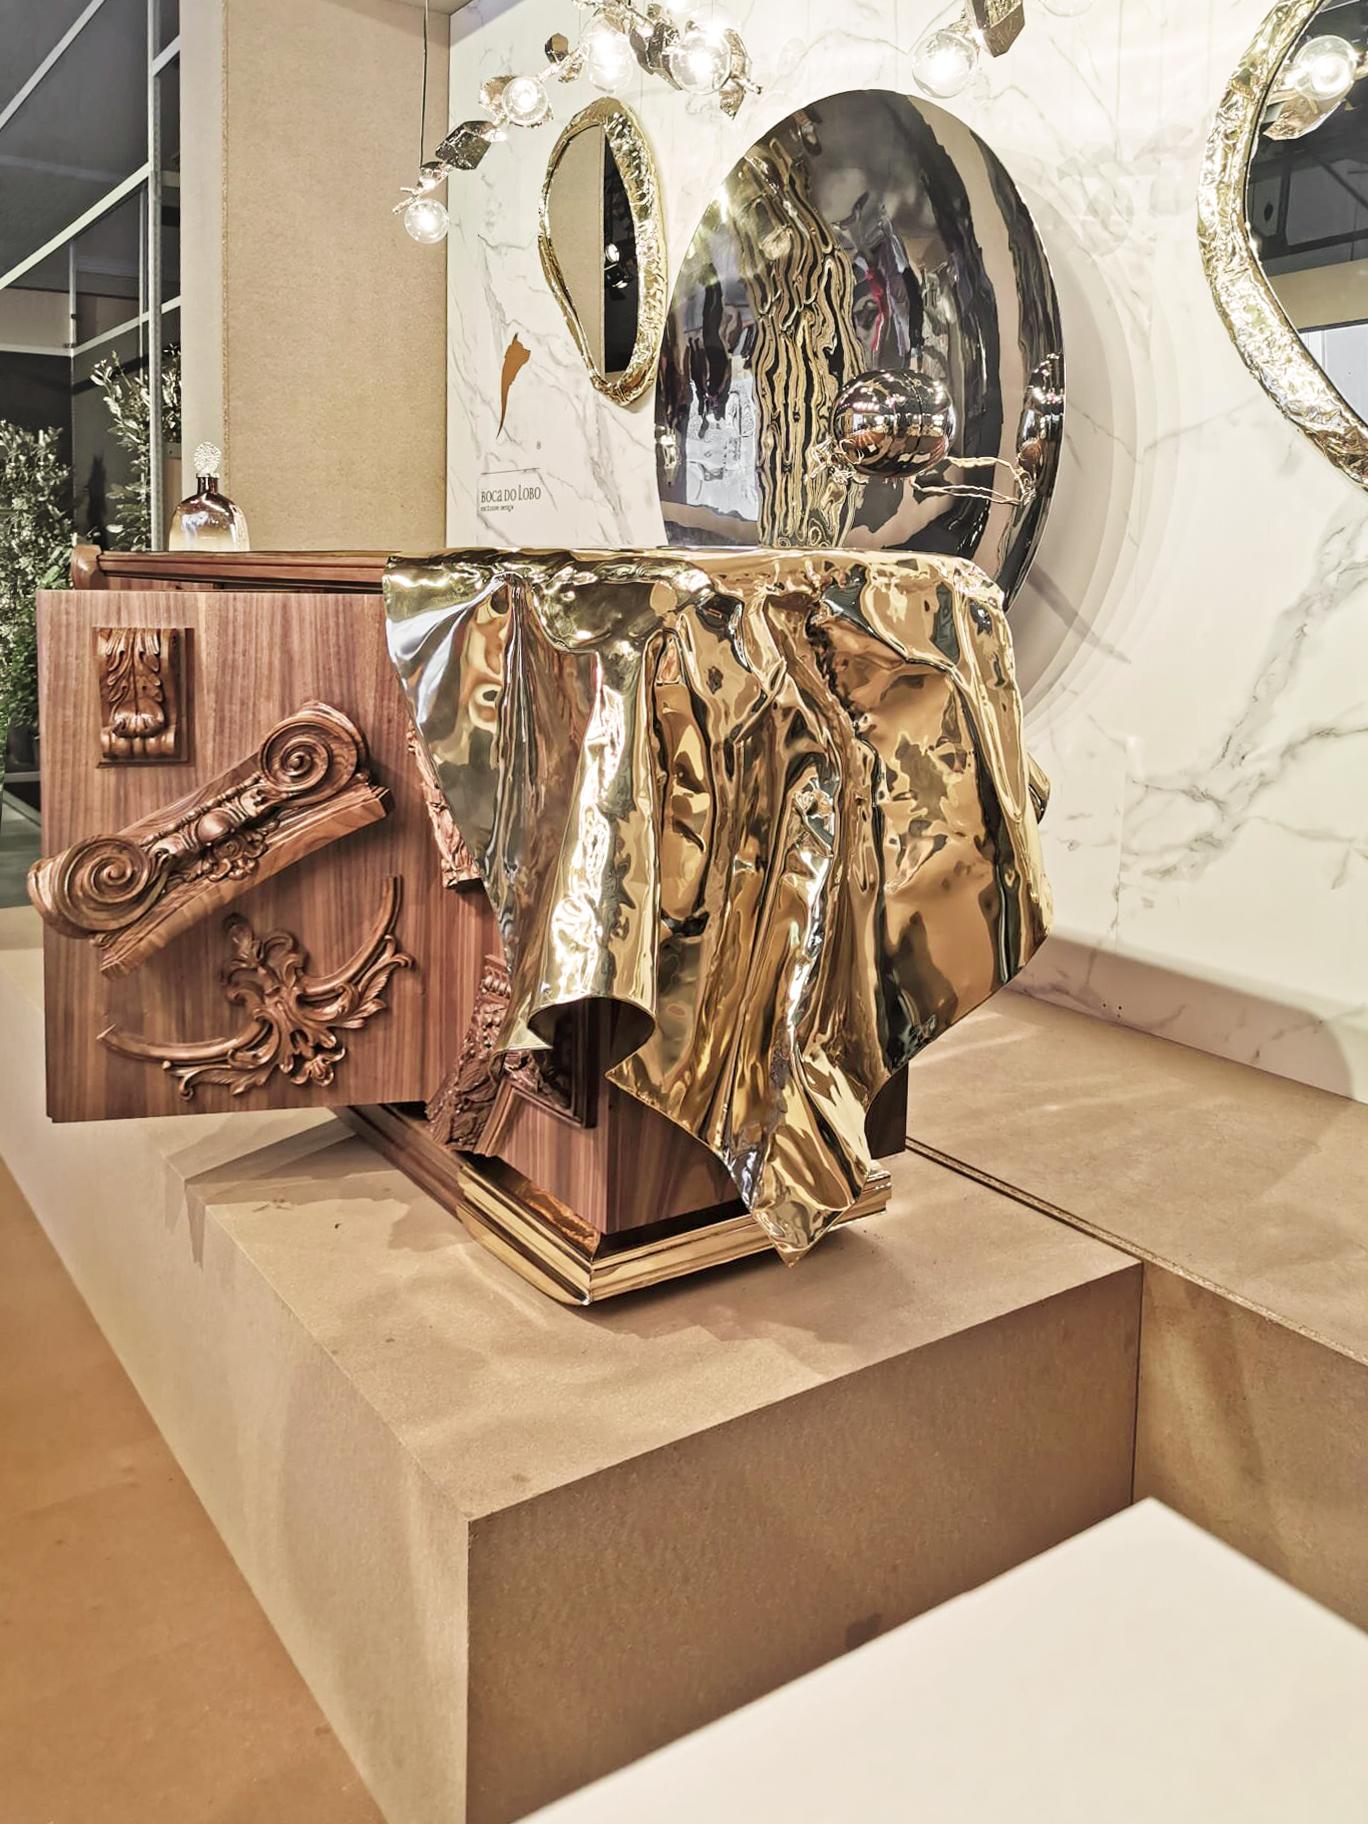 Milan Design Week - Meet The Boca do Lobo's First Highlights At Supersalone 2021!